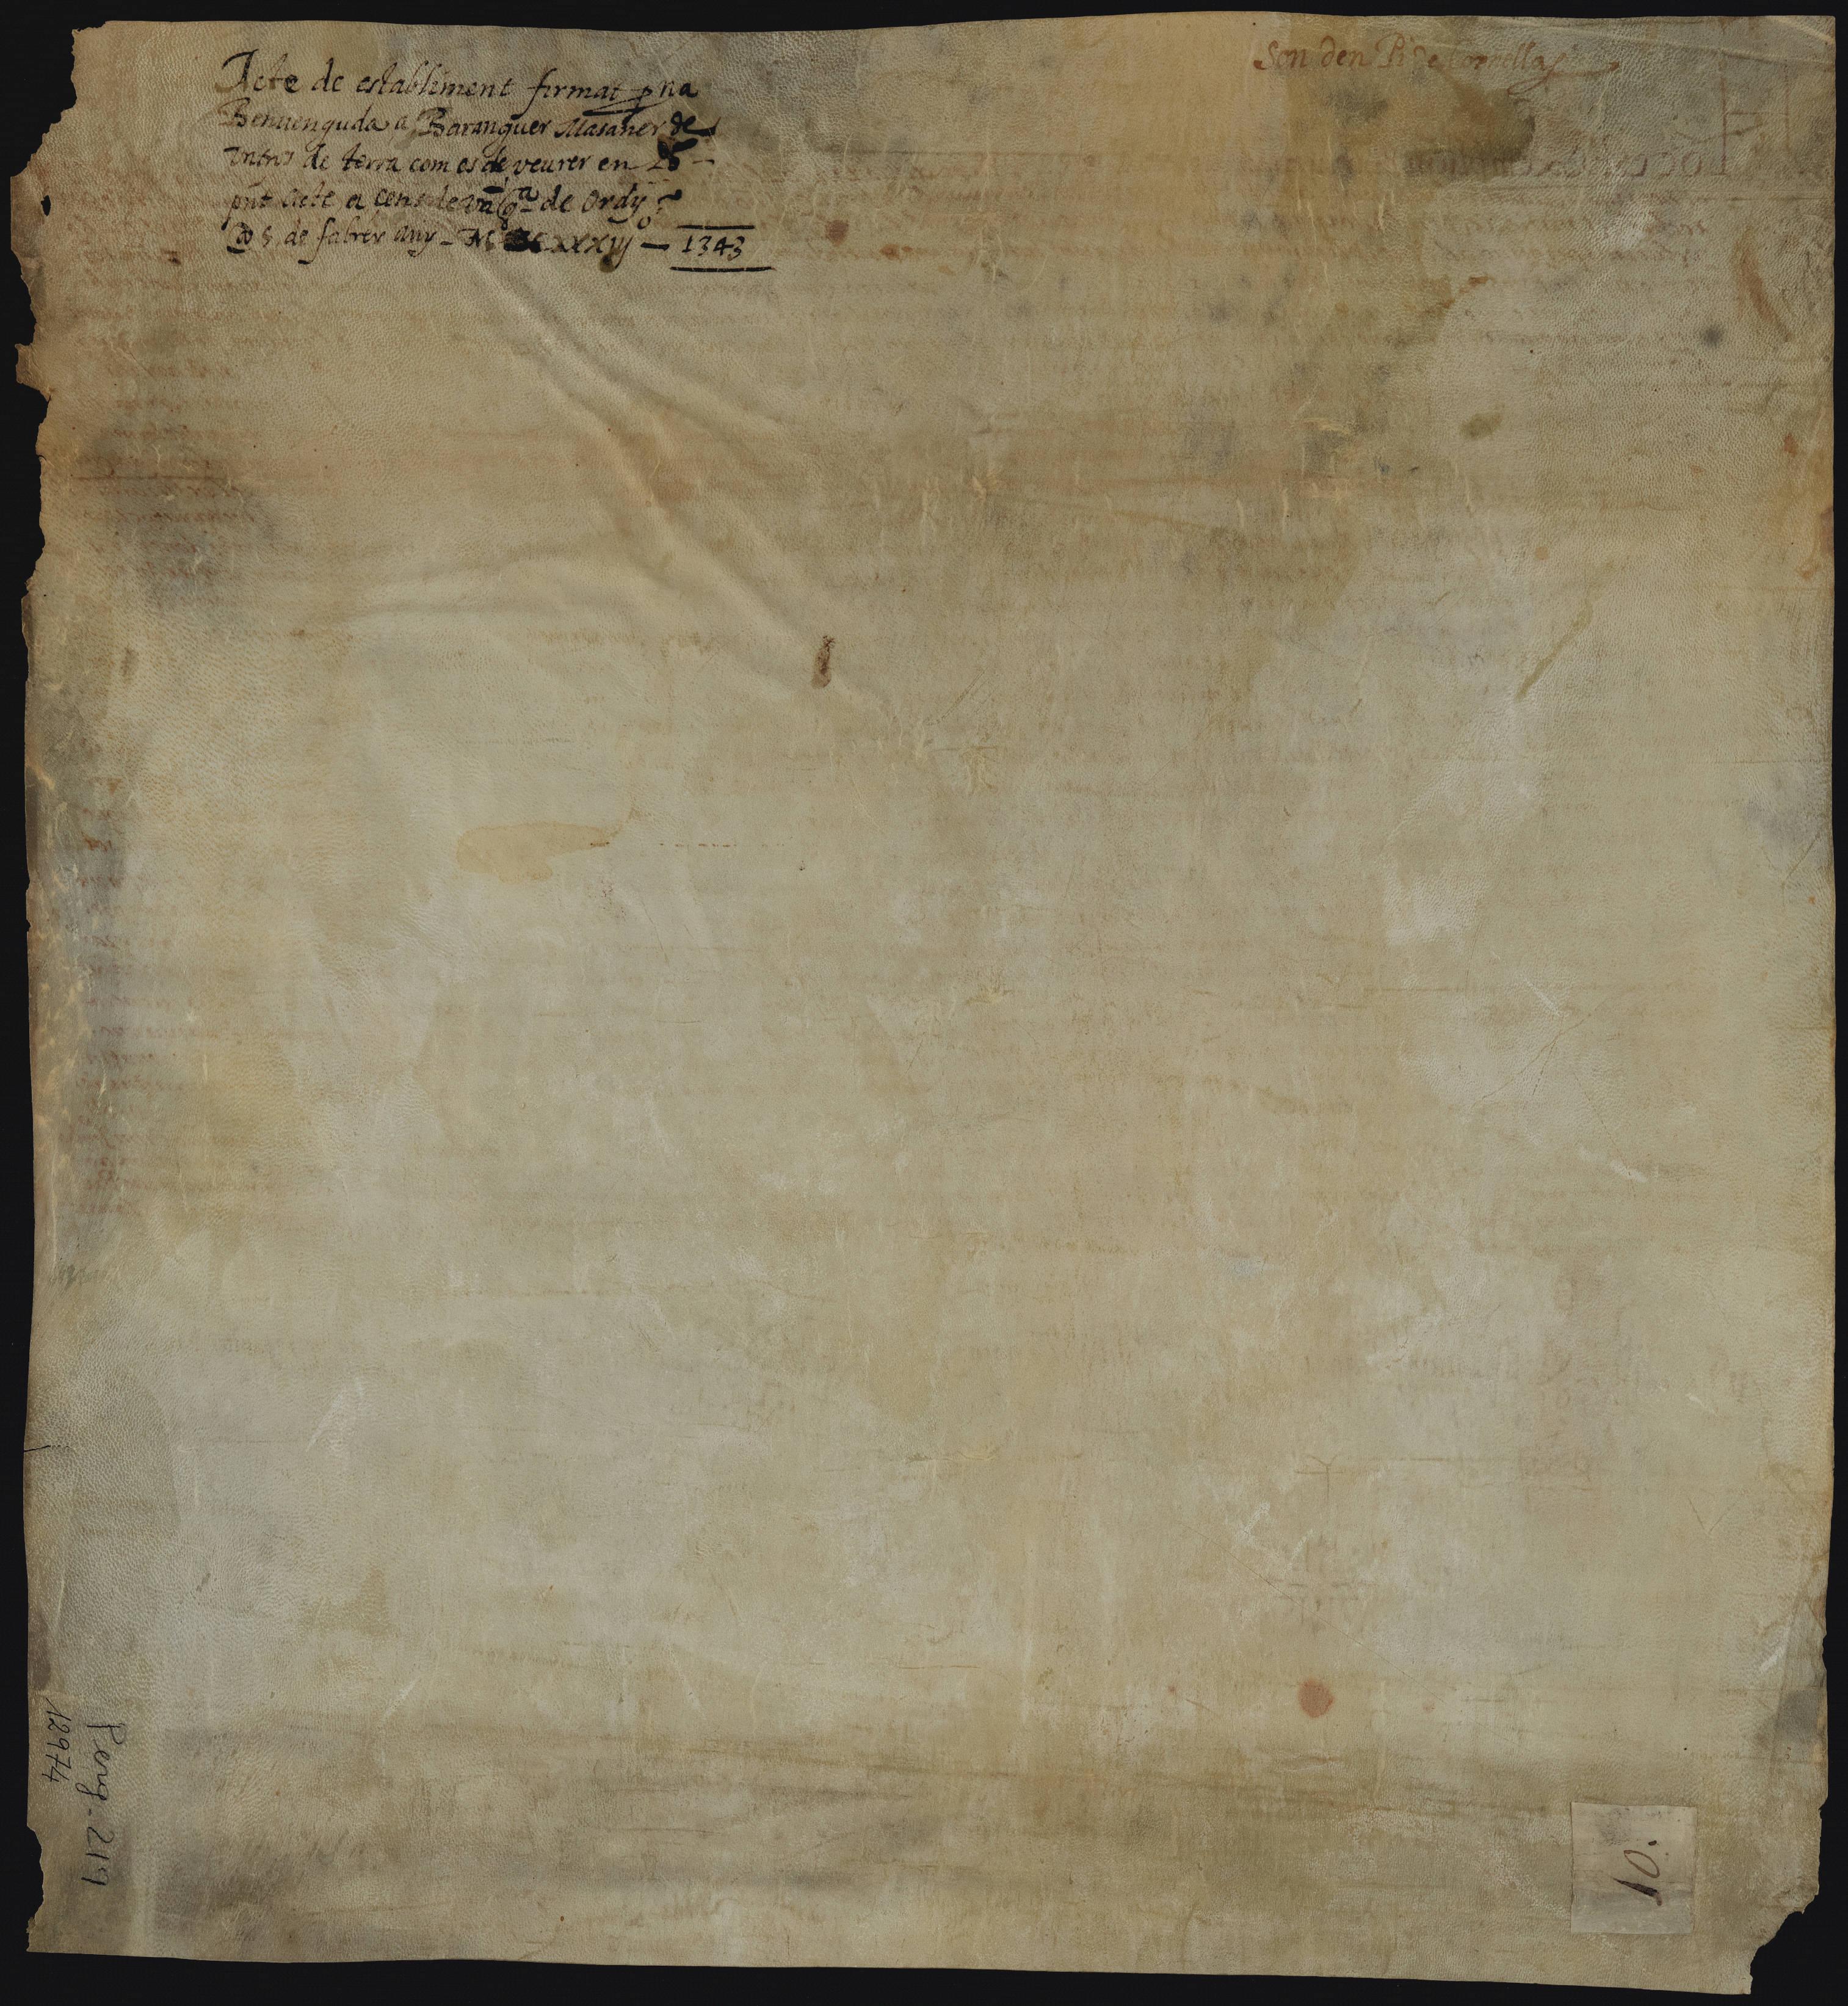 Verso - Recto 1343 Benvinguda Salat